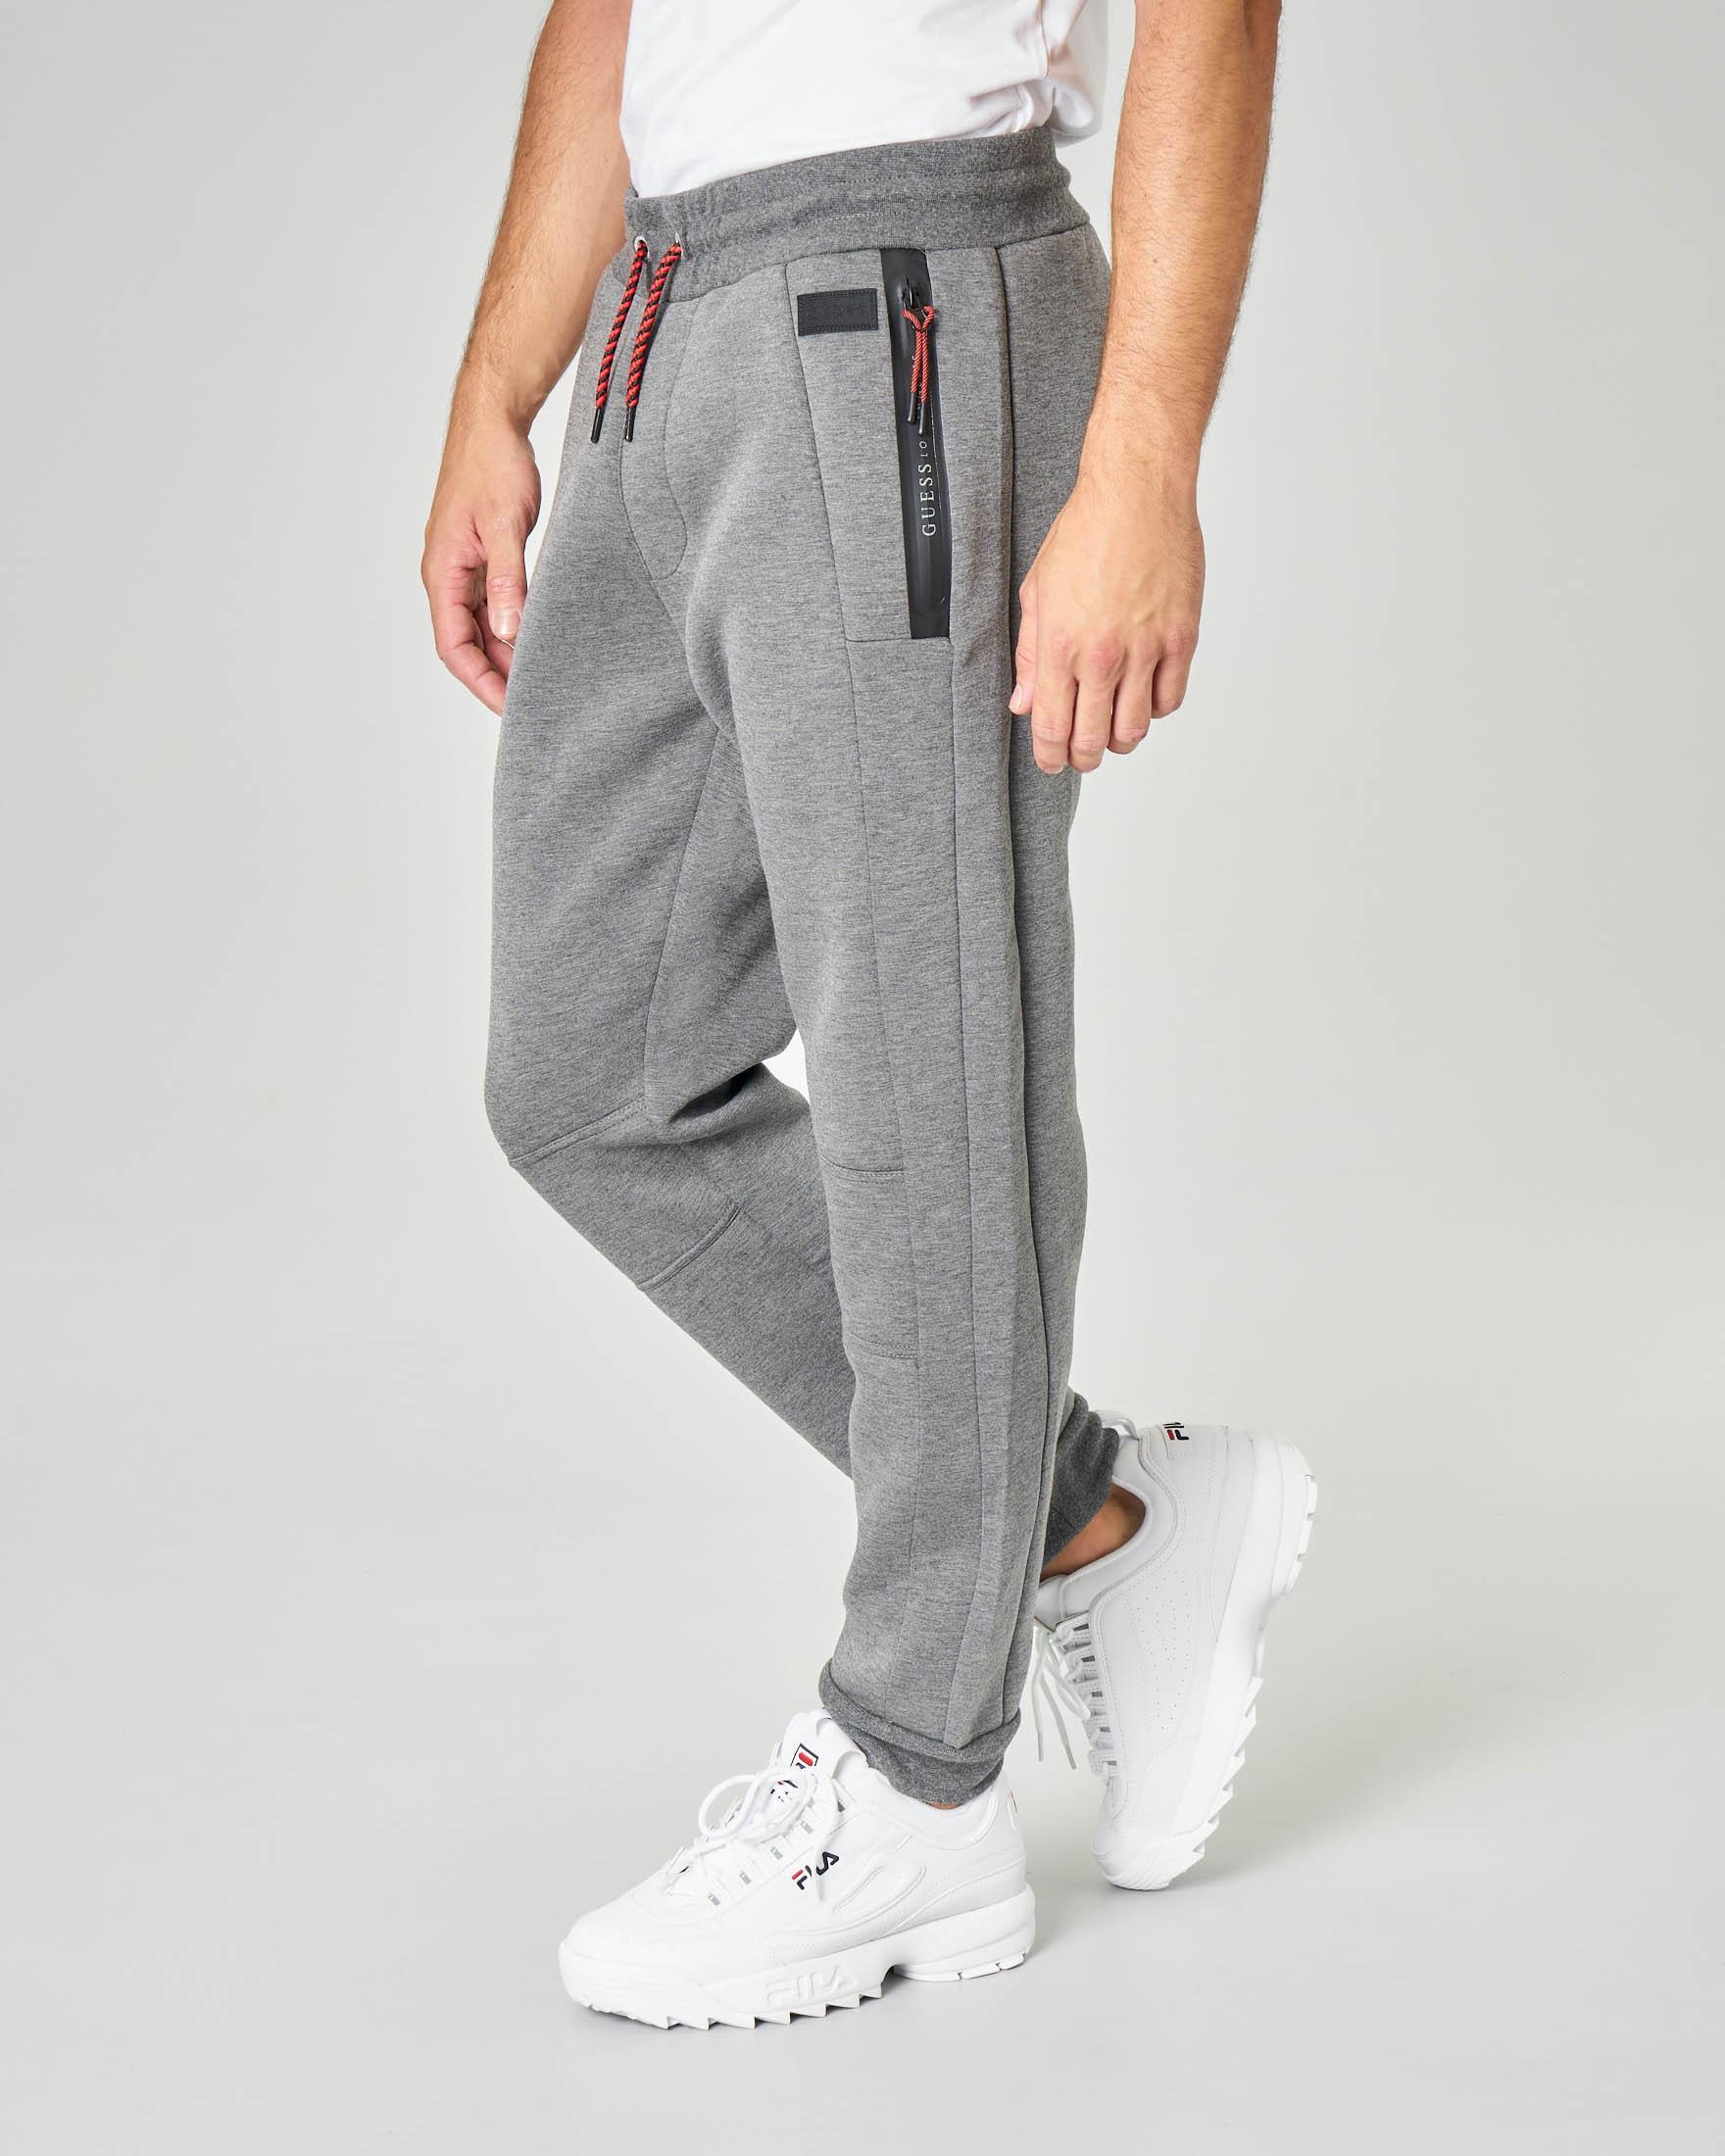 Pantalone grigio in felpa con zip termonastrate